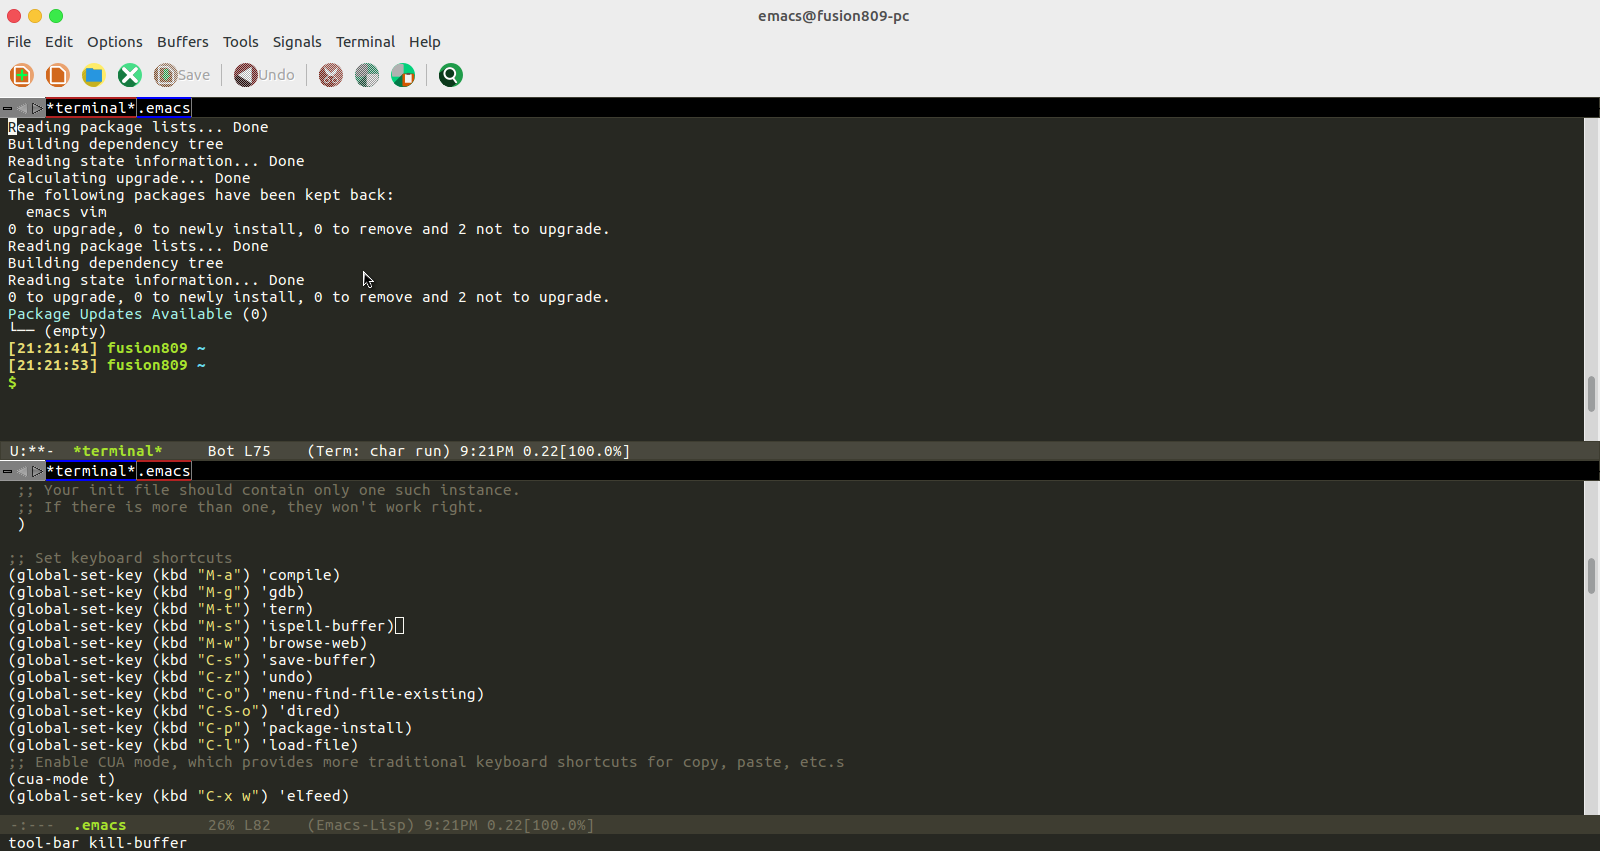 GitHub - fusion809/emacs: My GNU Emacs configuration settings